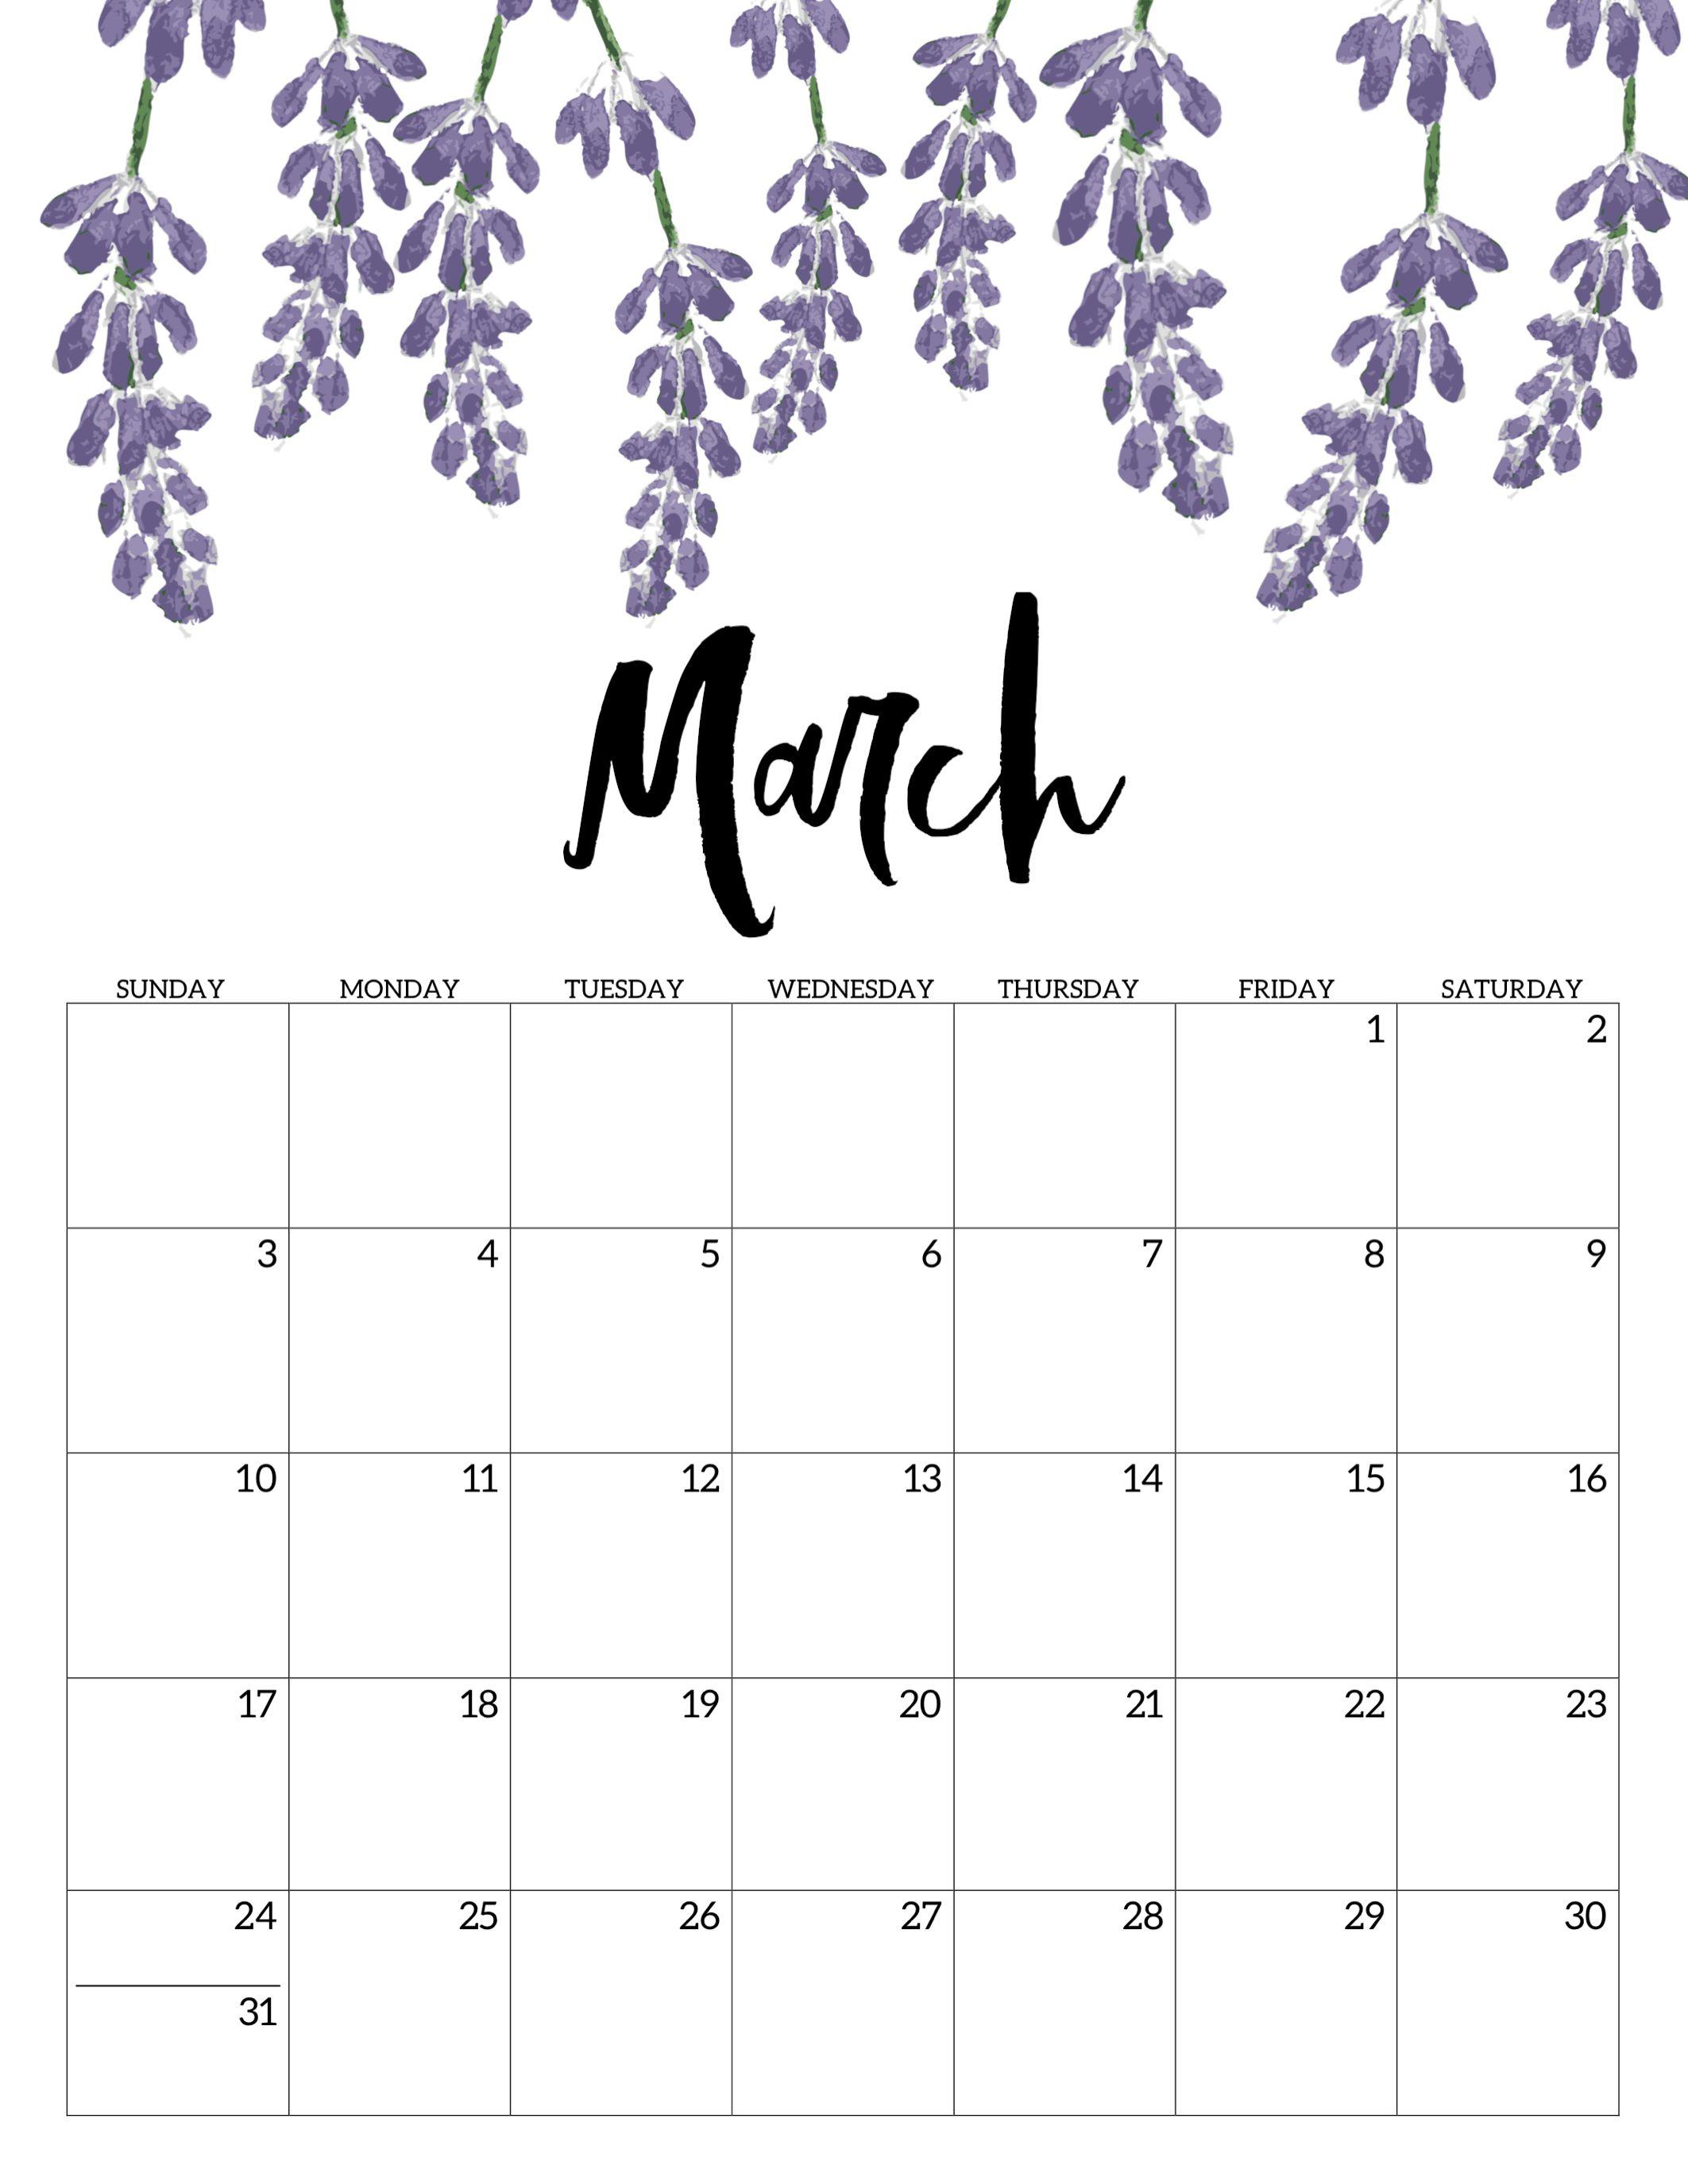 March 2019 Floral Desk Calendar #march #march2019 #march2019Calendar